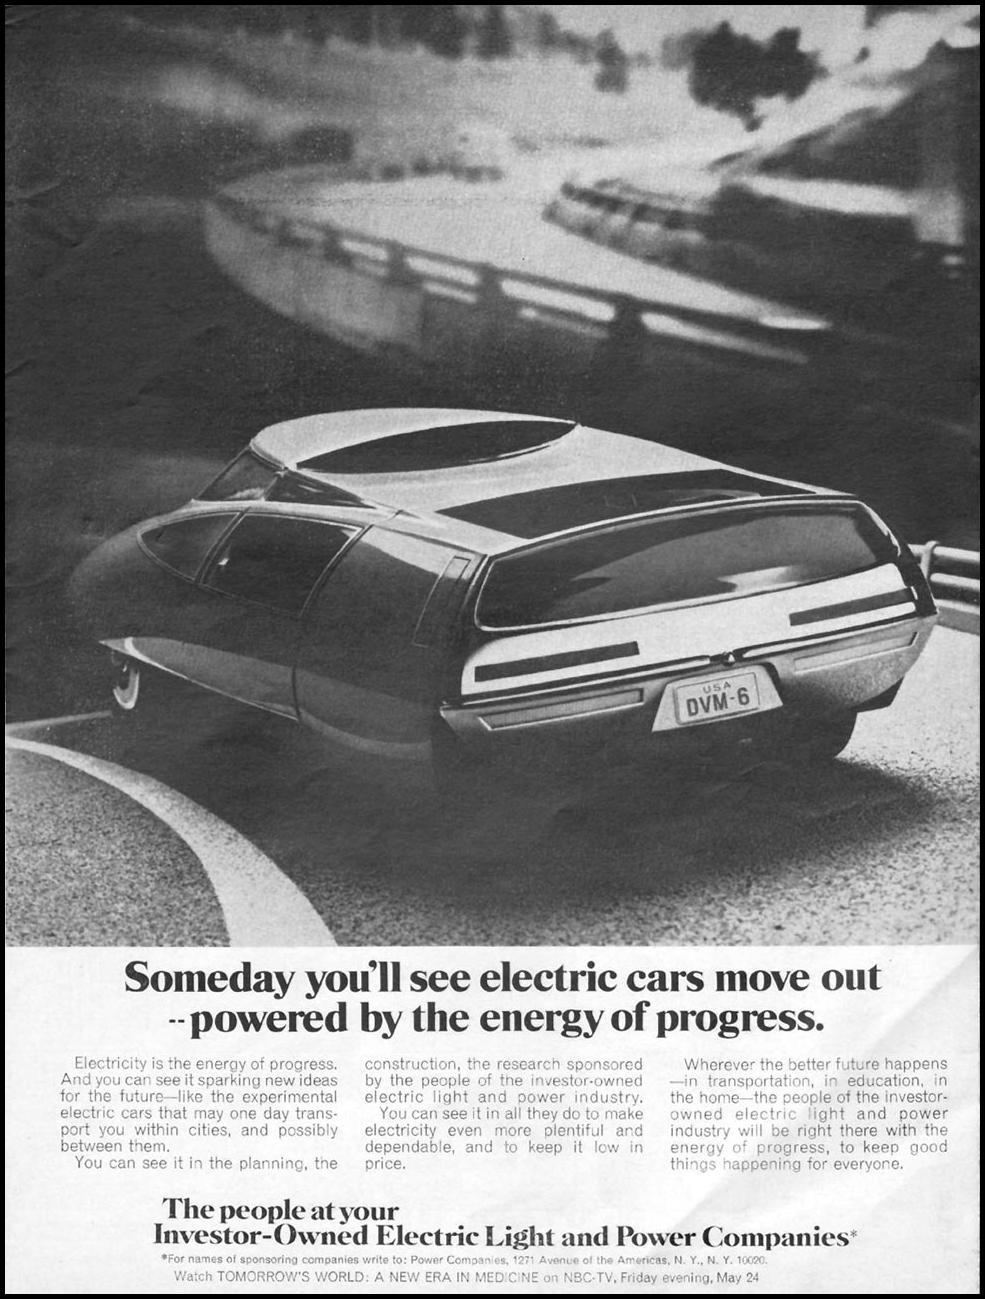 ELECTRIC CARS NEWSWEEK 05/20/1968 p. 1